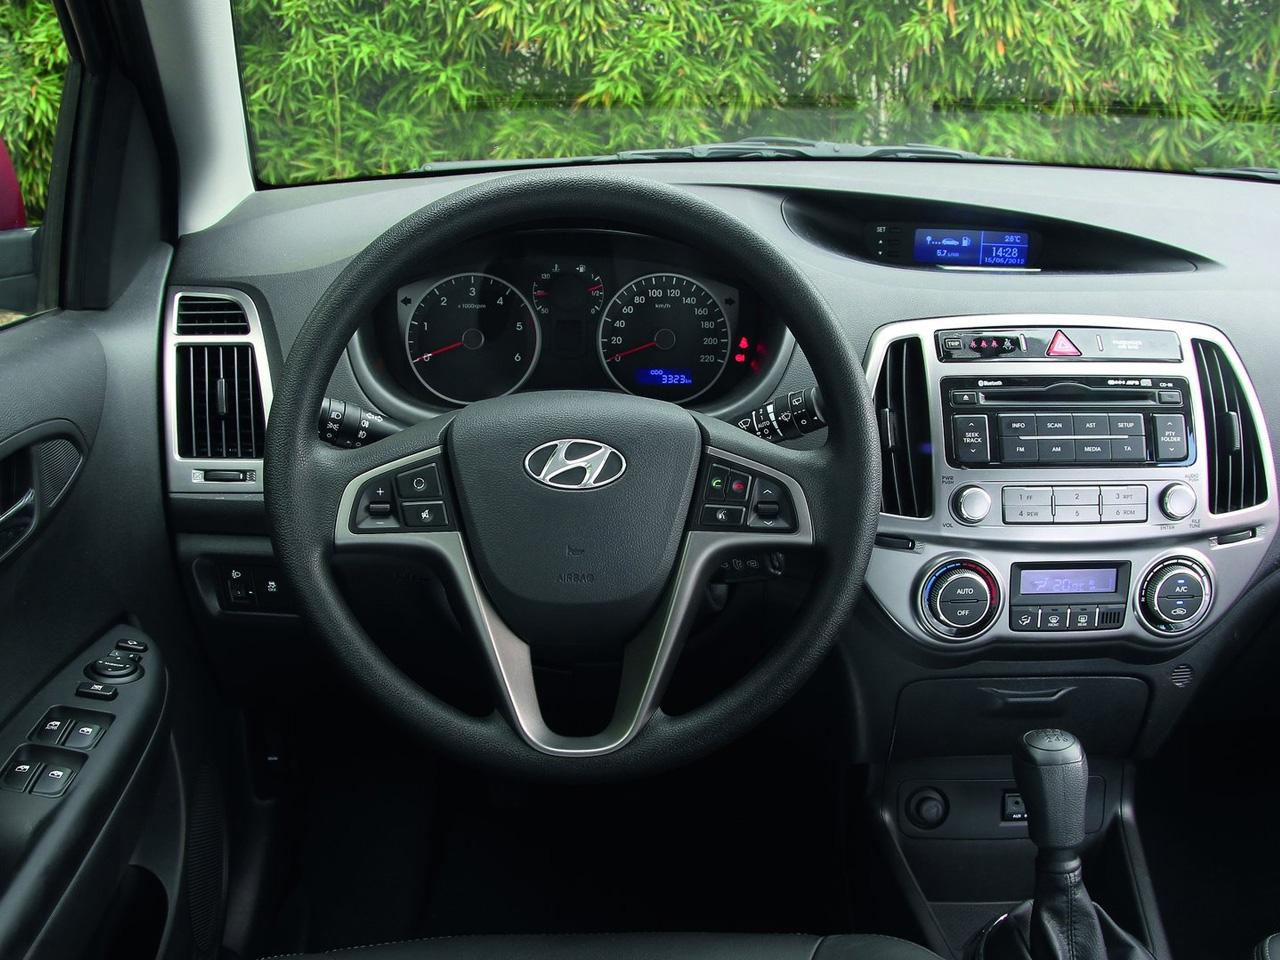 Farkl otomobiller hakk nda farkl testler ve yorumlar mant k evlili i hyundai i20 - Hyundai i20 interior ...